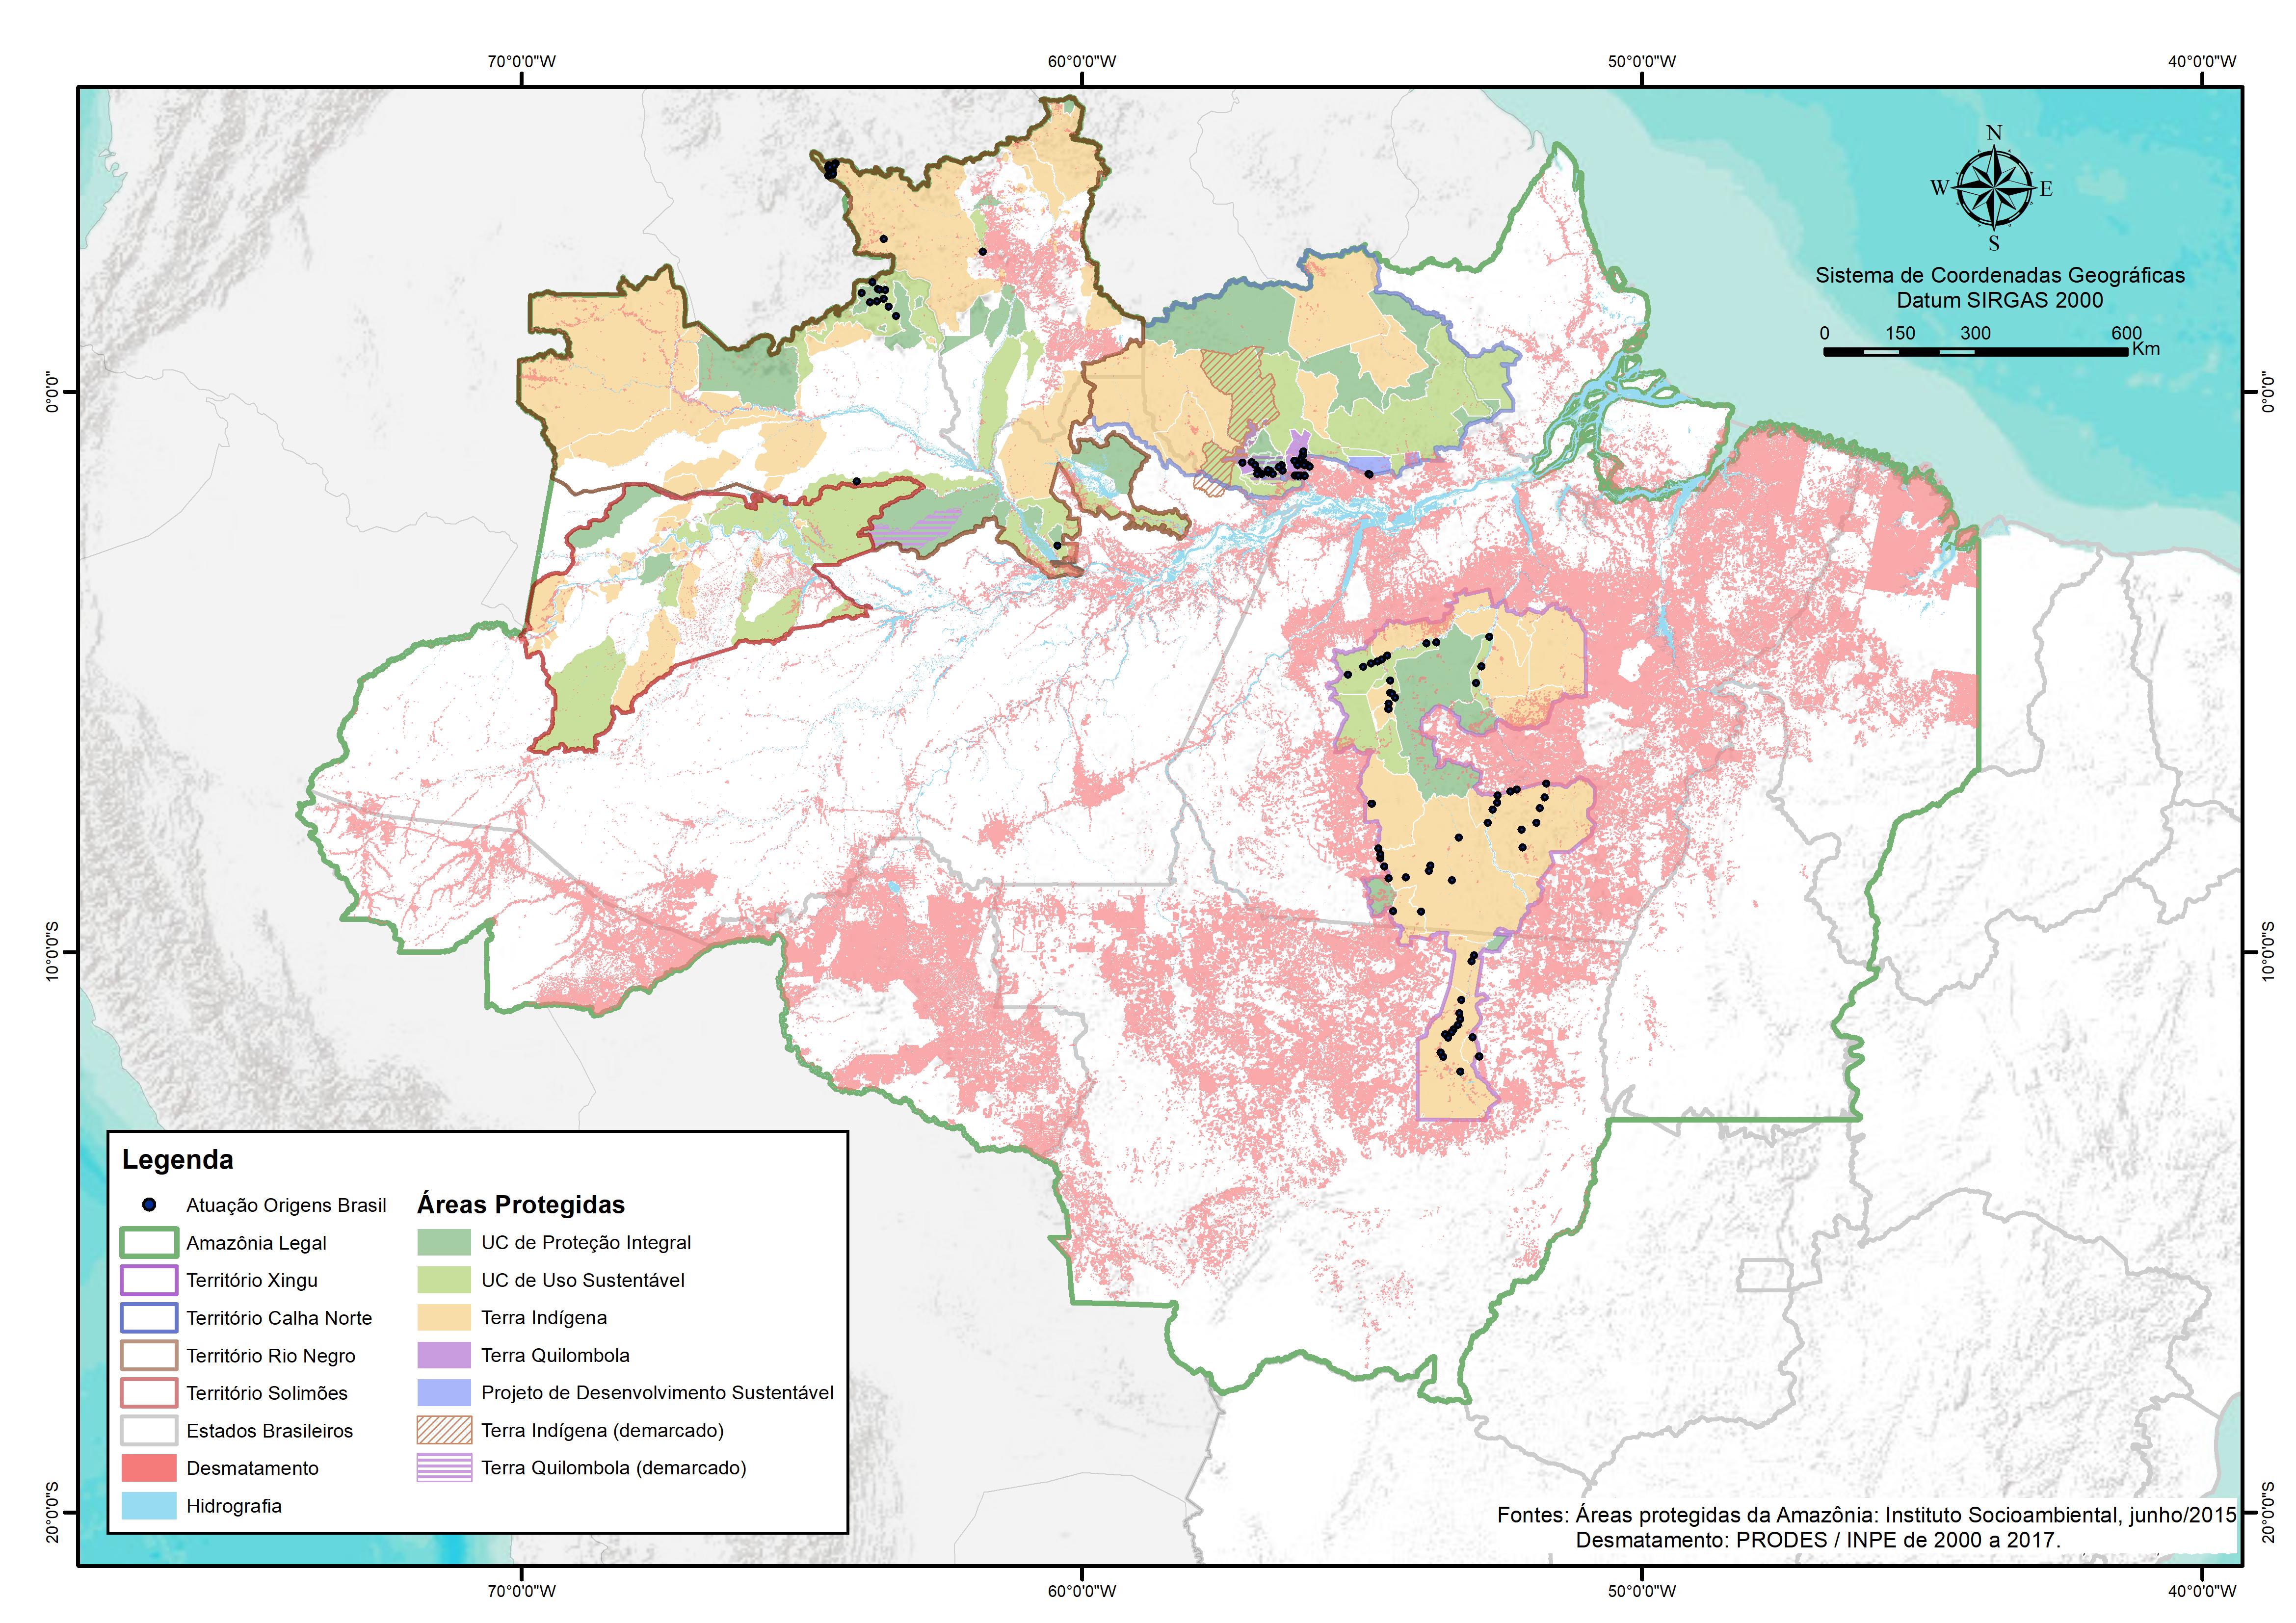 te_CalhaNorte_Xingu_RioNegro_Desmatamento_A4_2019.png